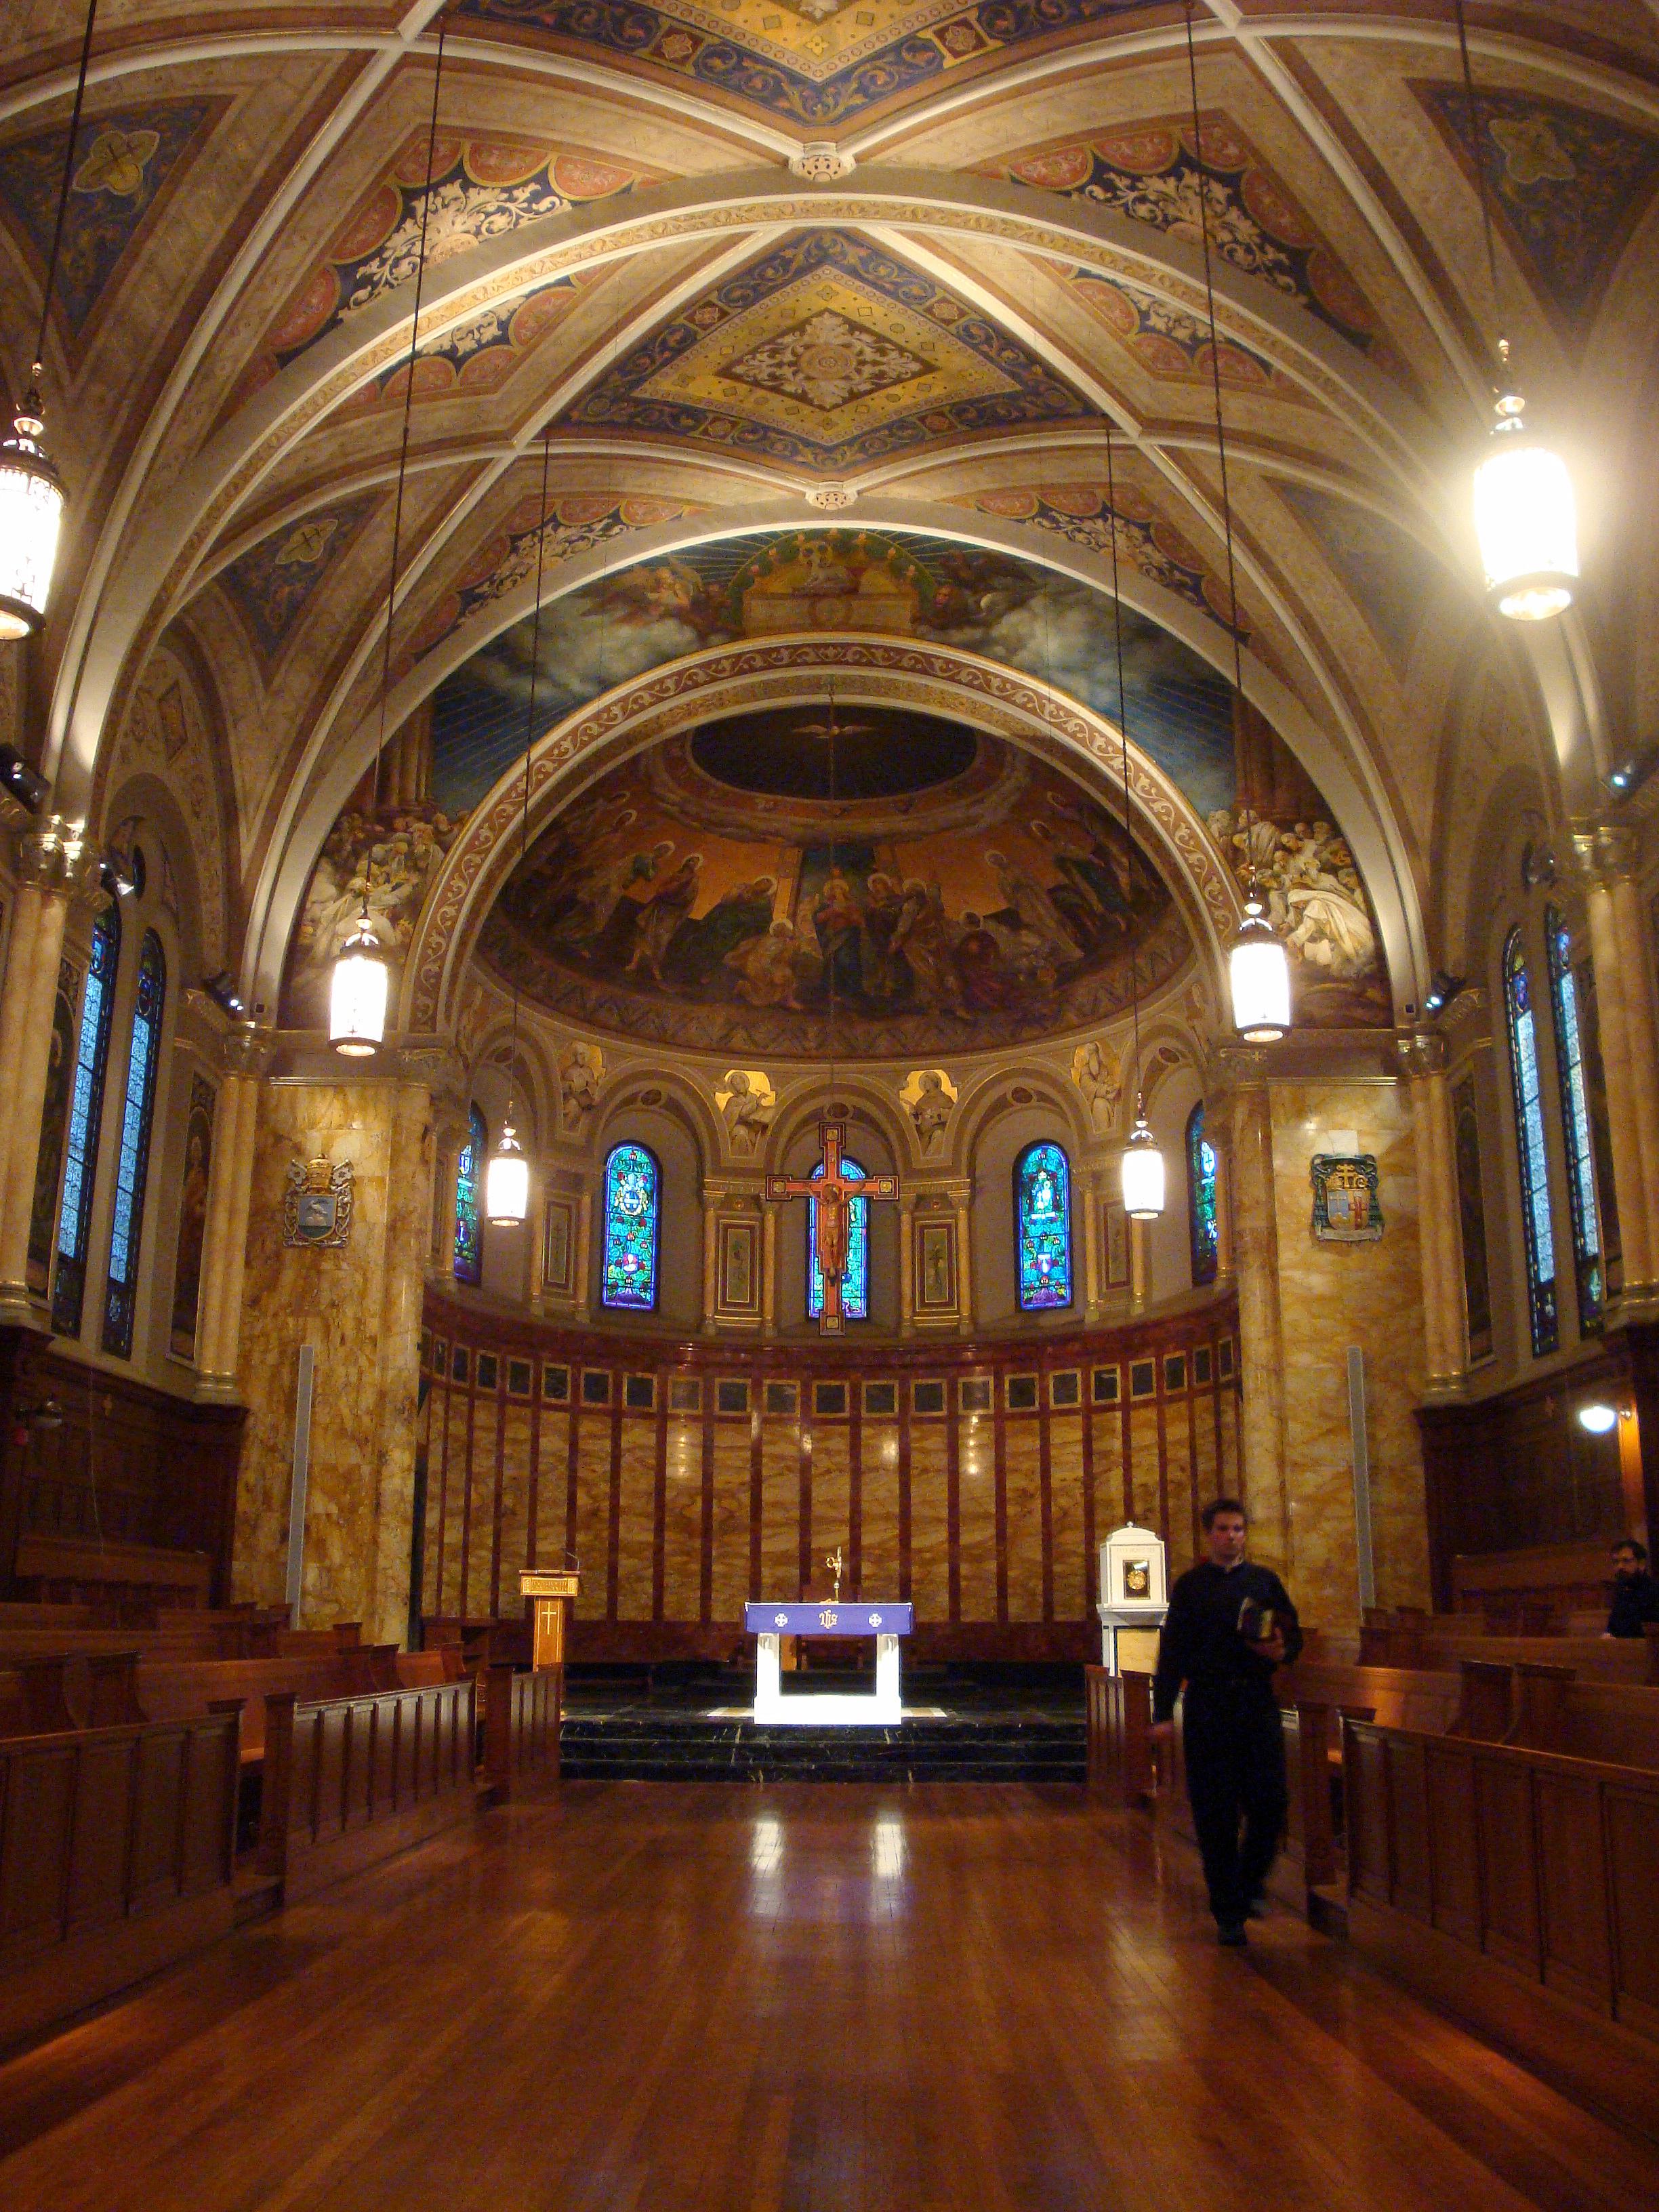 2%2f2c%2fst johns seminary chapel